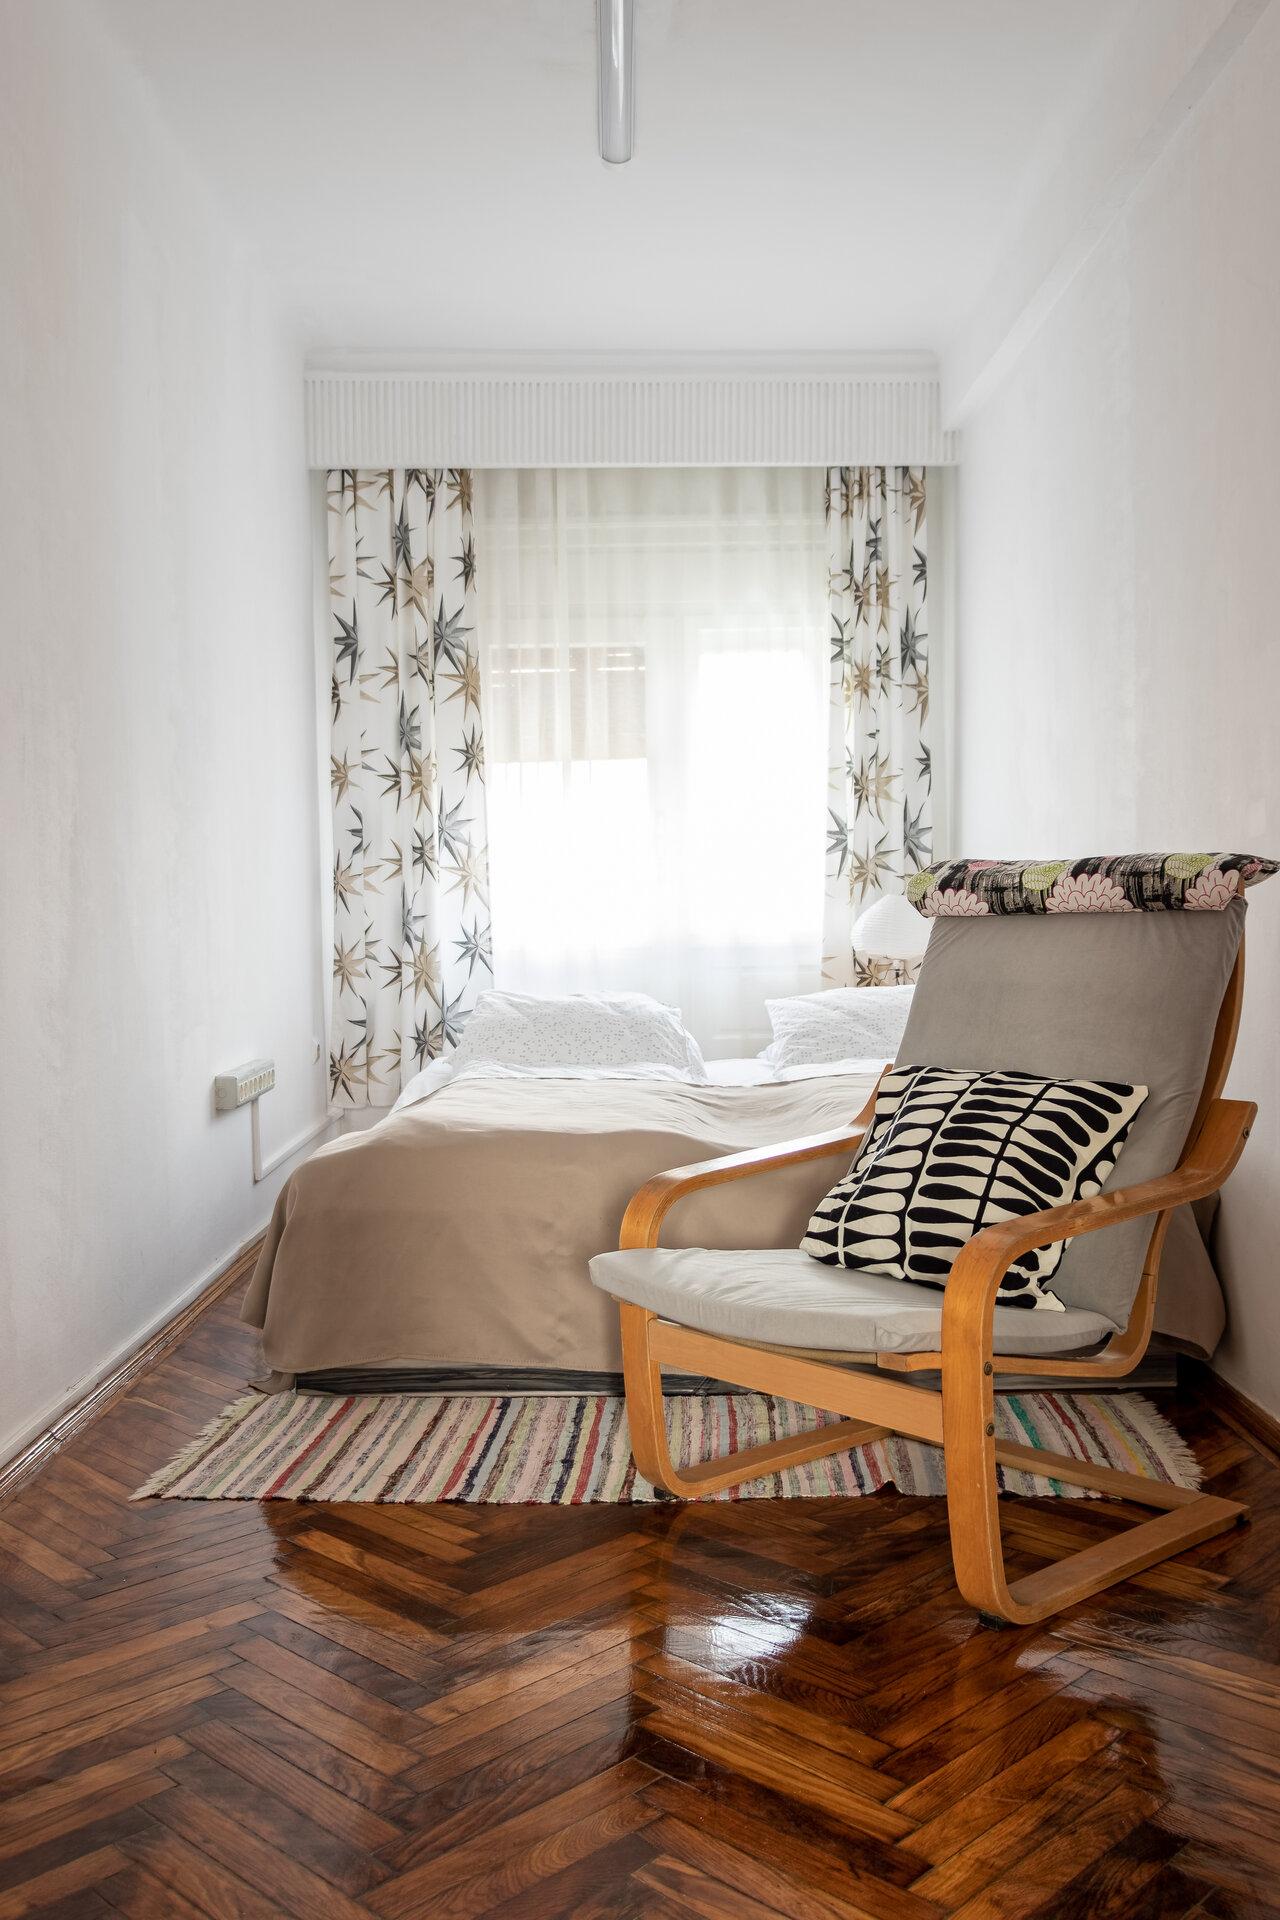 FoxInn Hostel Oradea